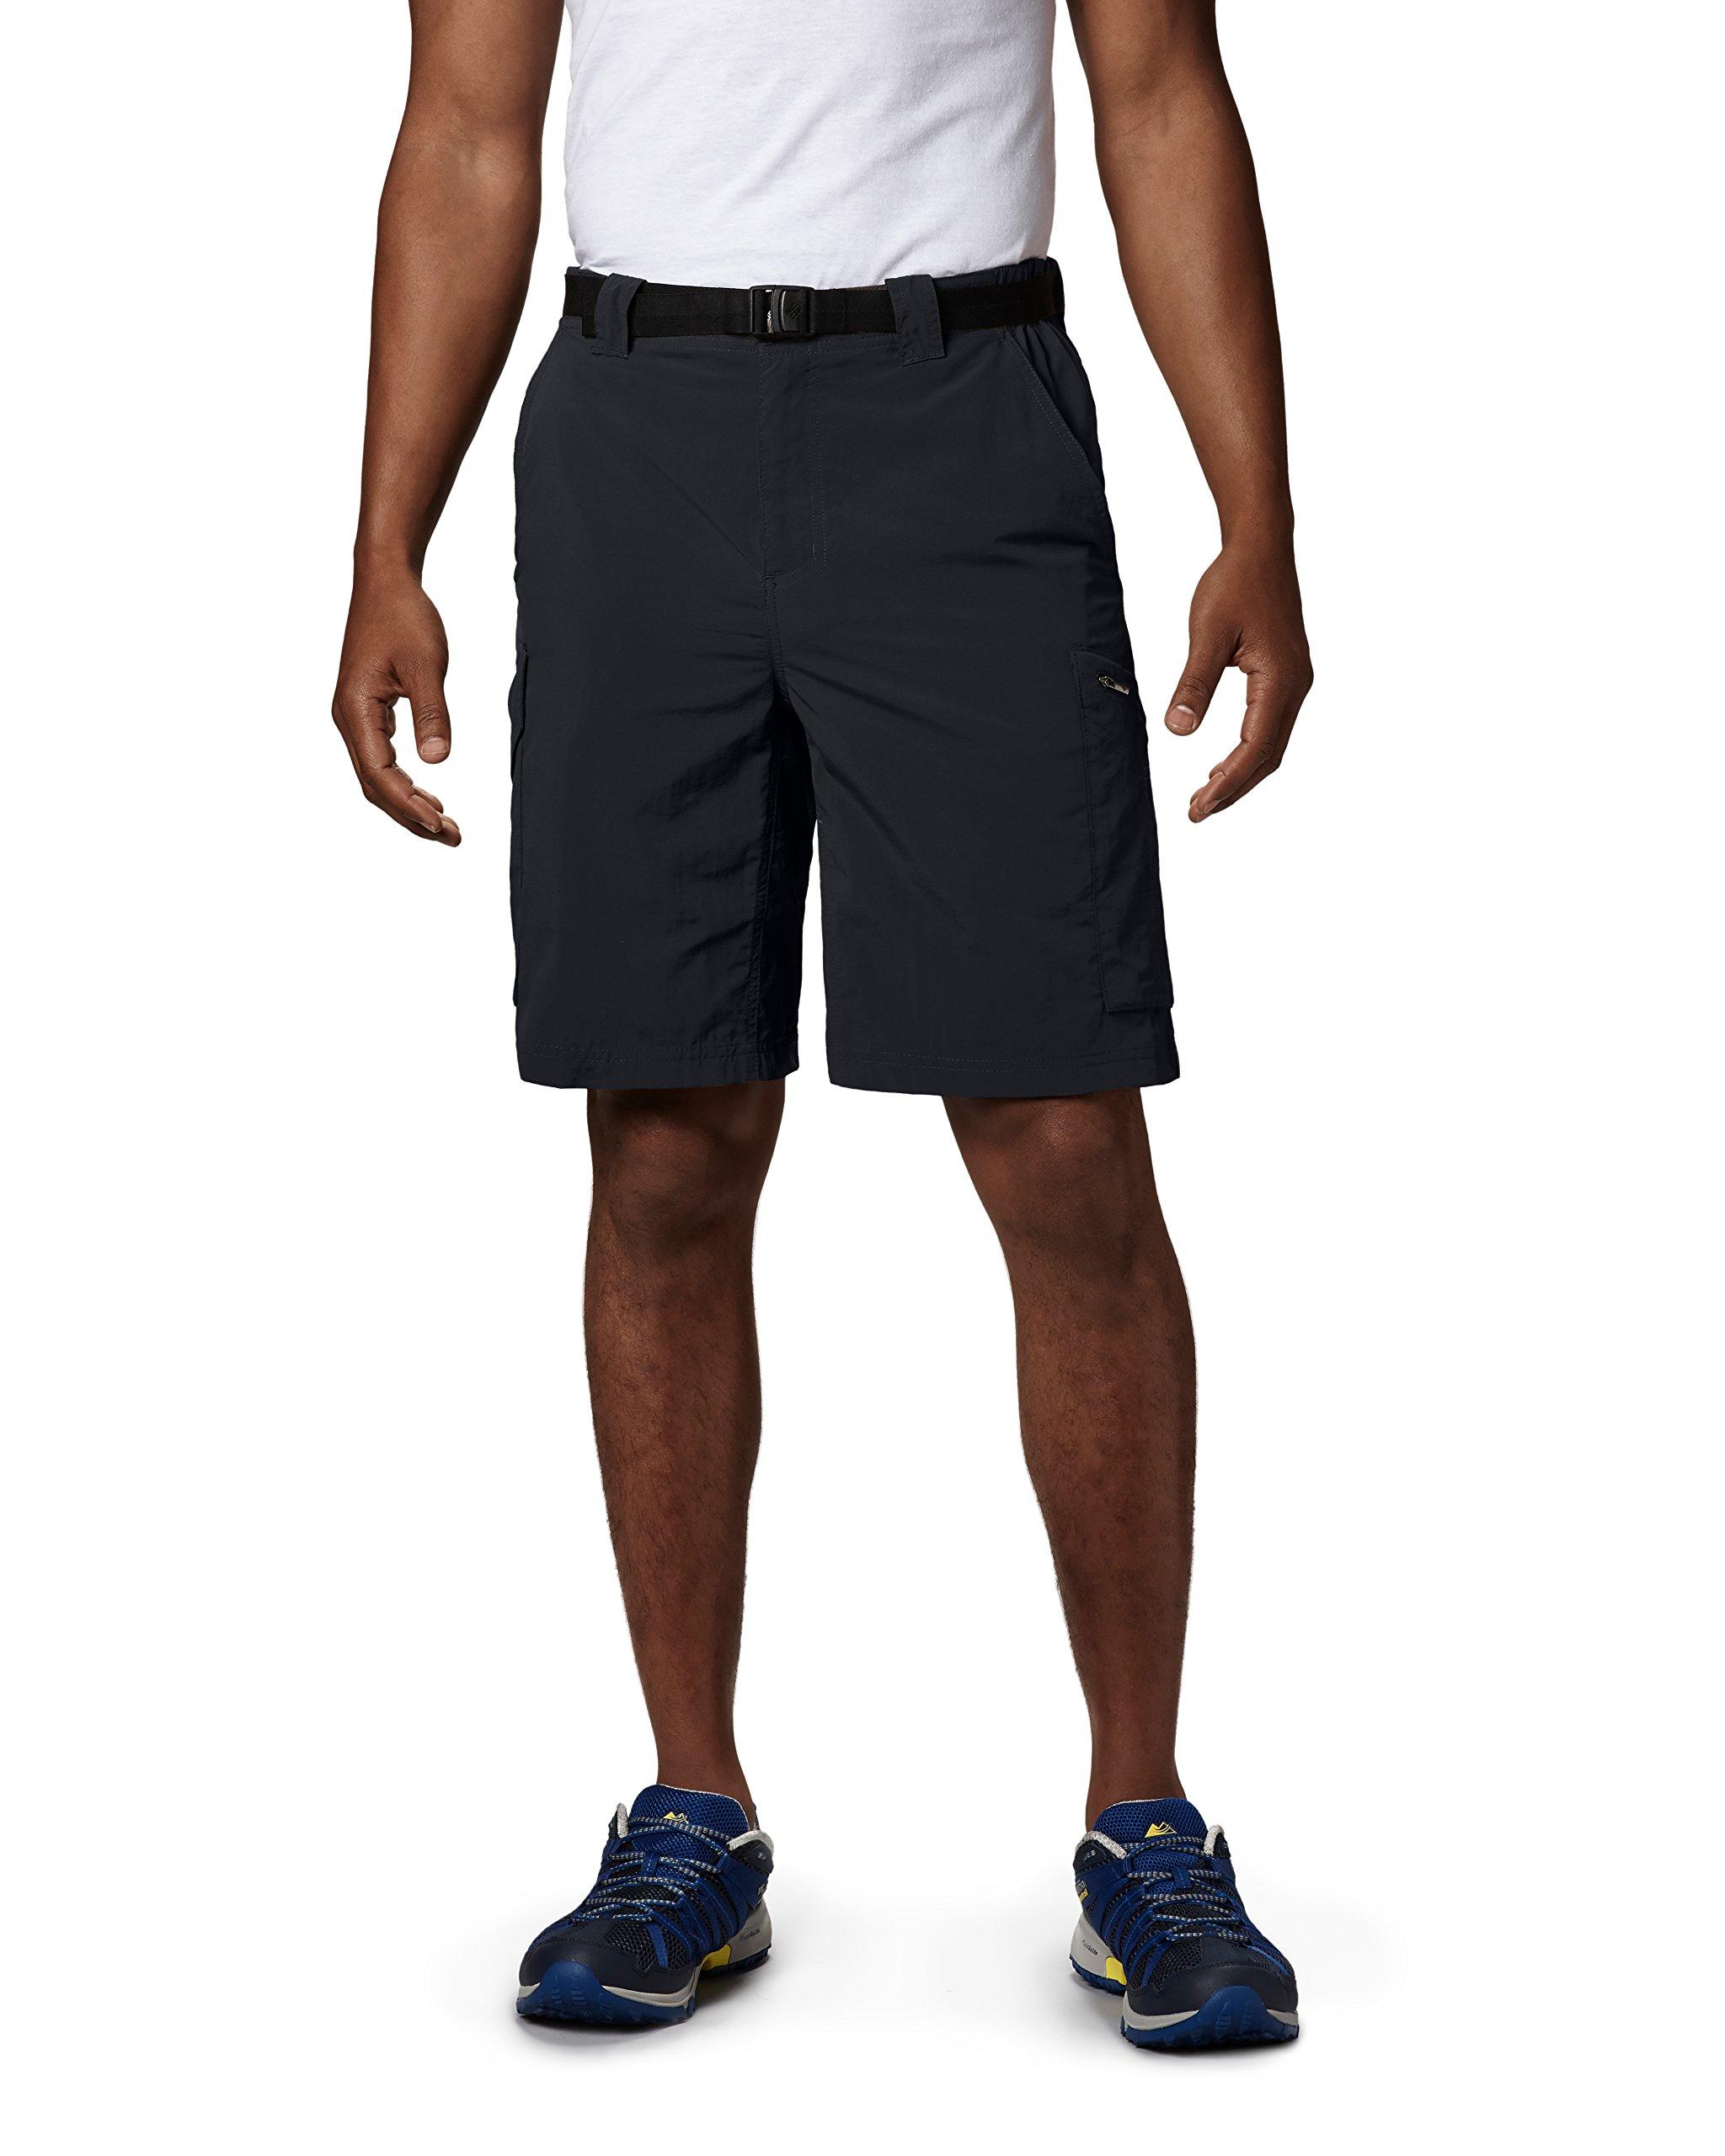 Columbia Sportswear Men's Big and Tall Silver Ridge Cargo Shorts, Black, 46 x 12